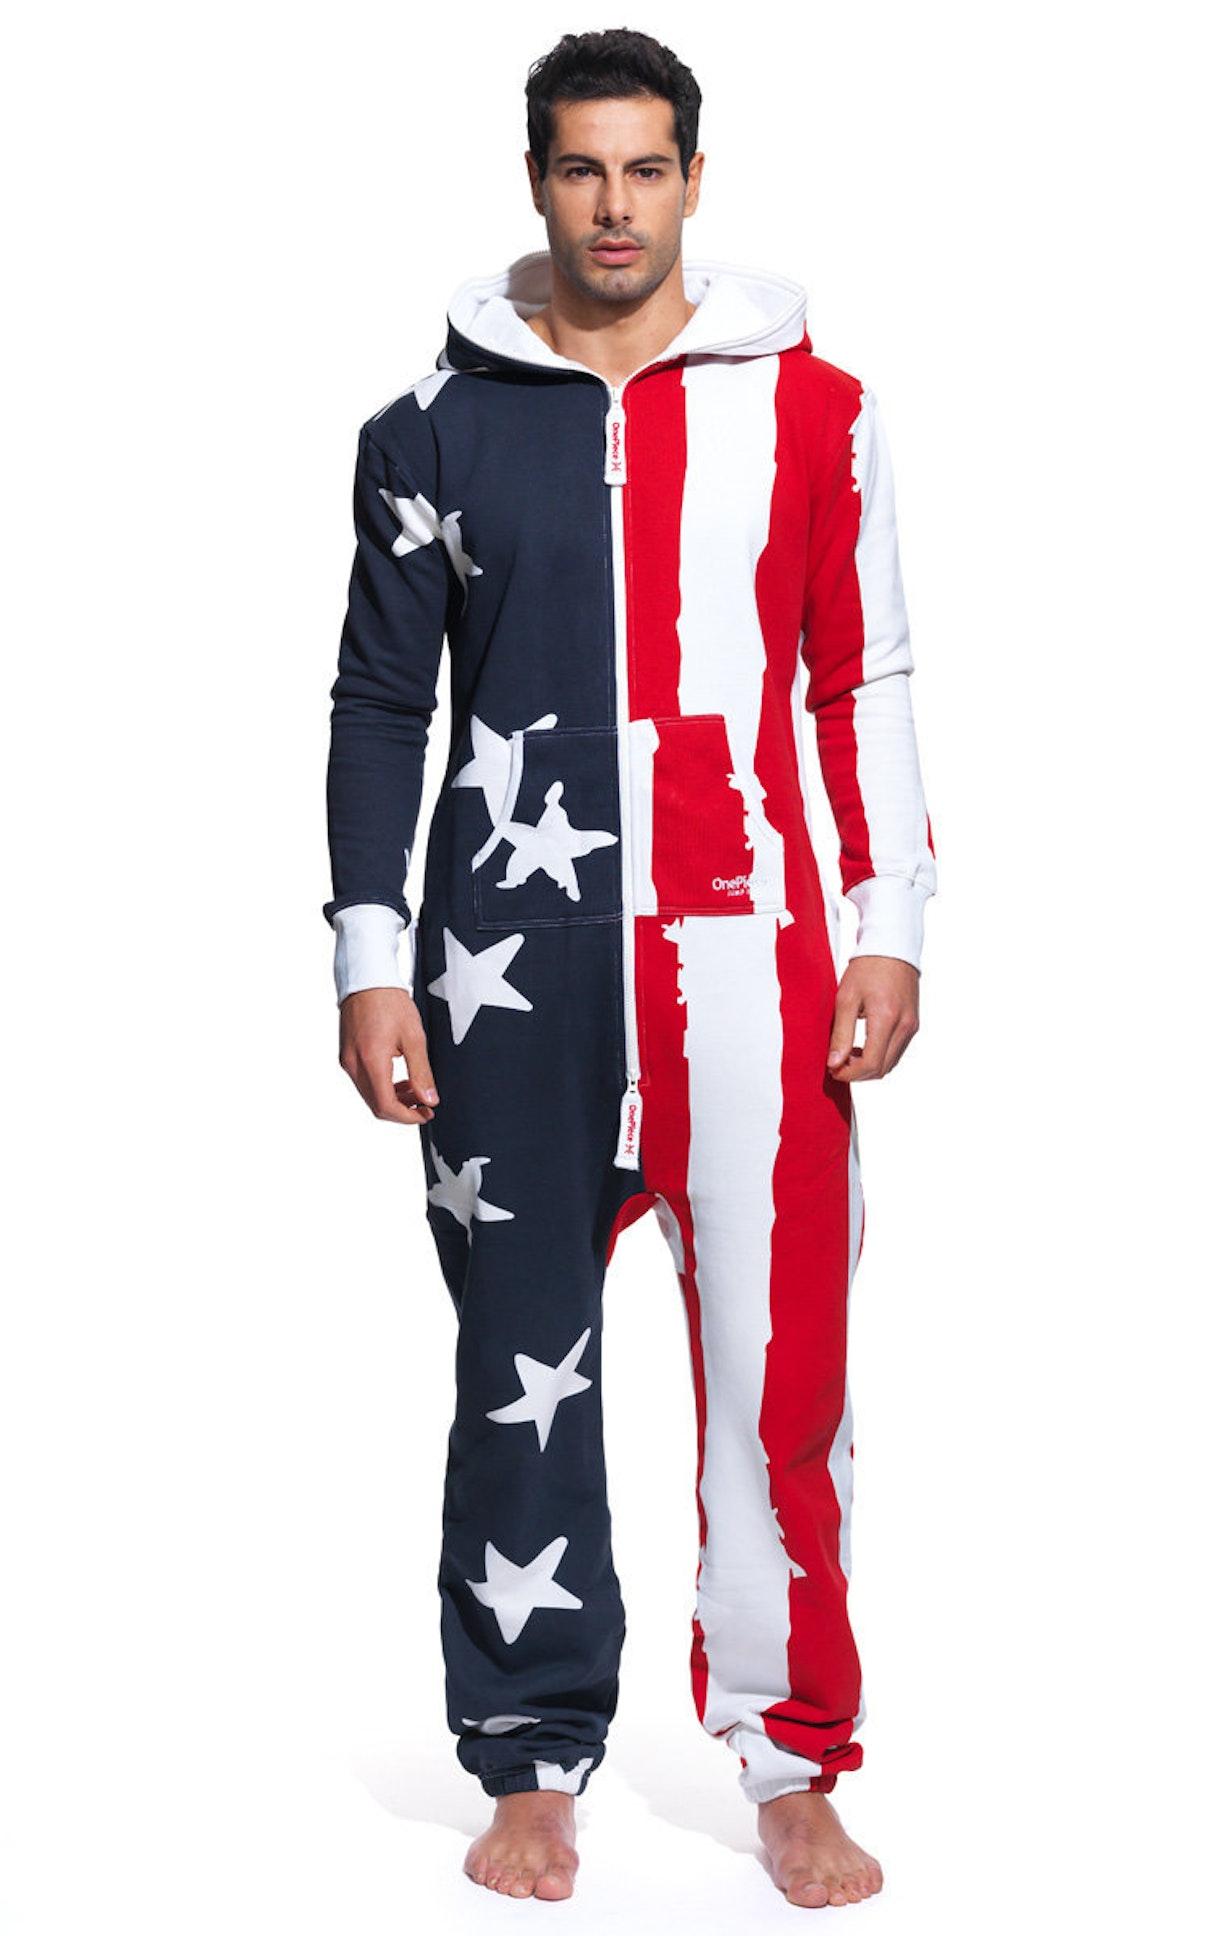 Onepiece usa onesie stars and stripes usa onesie for Mens dress shirt onesie